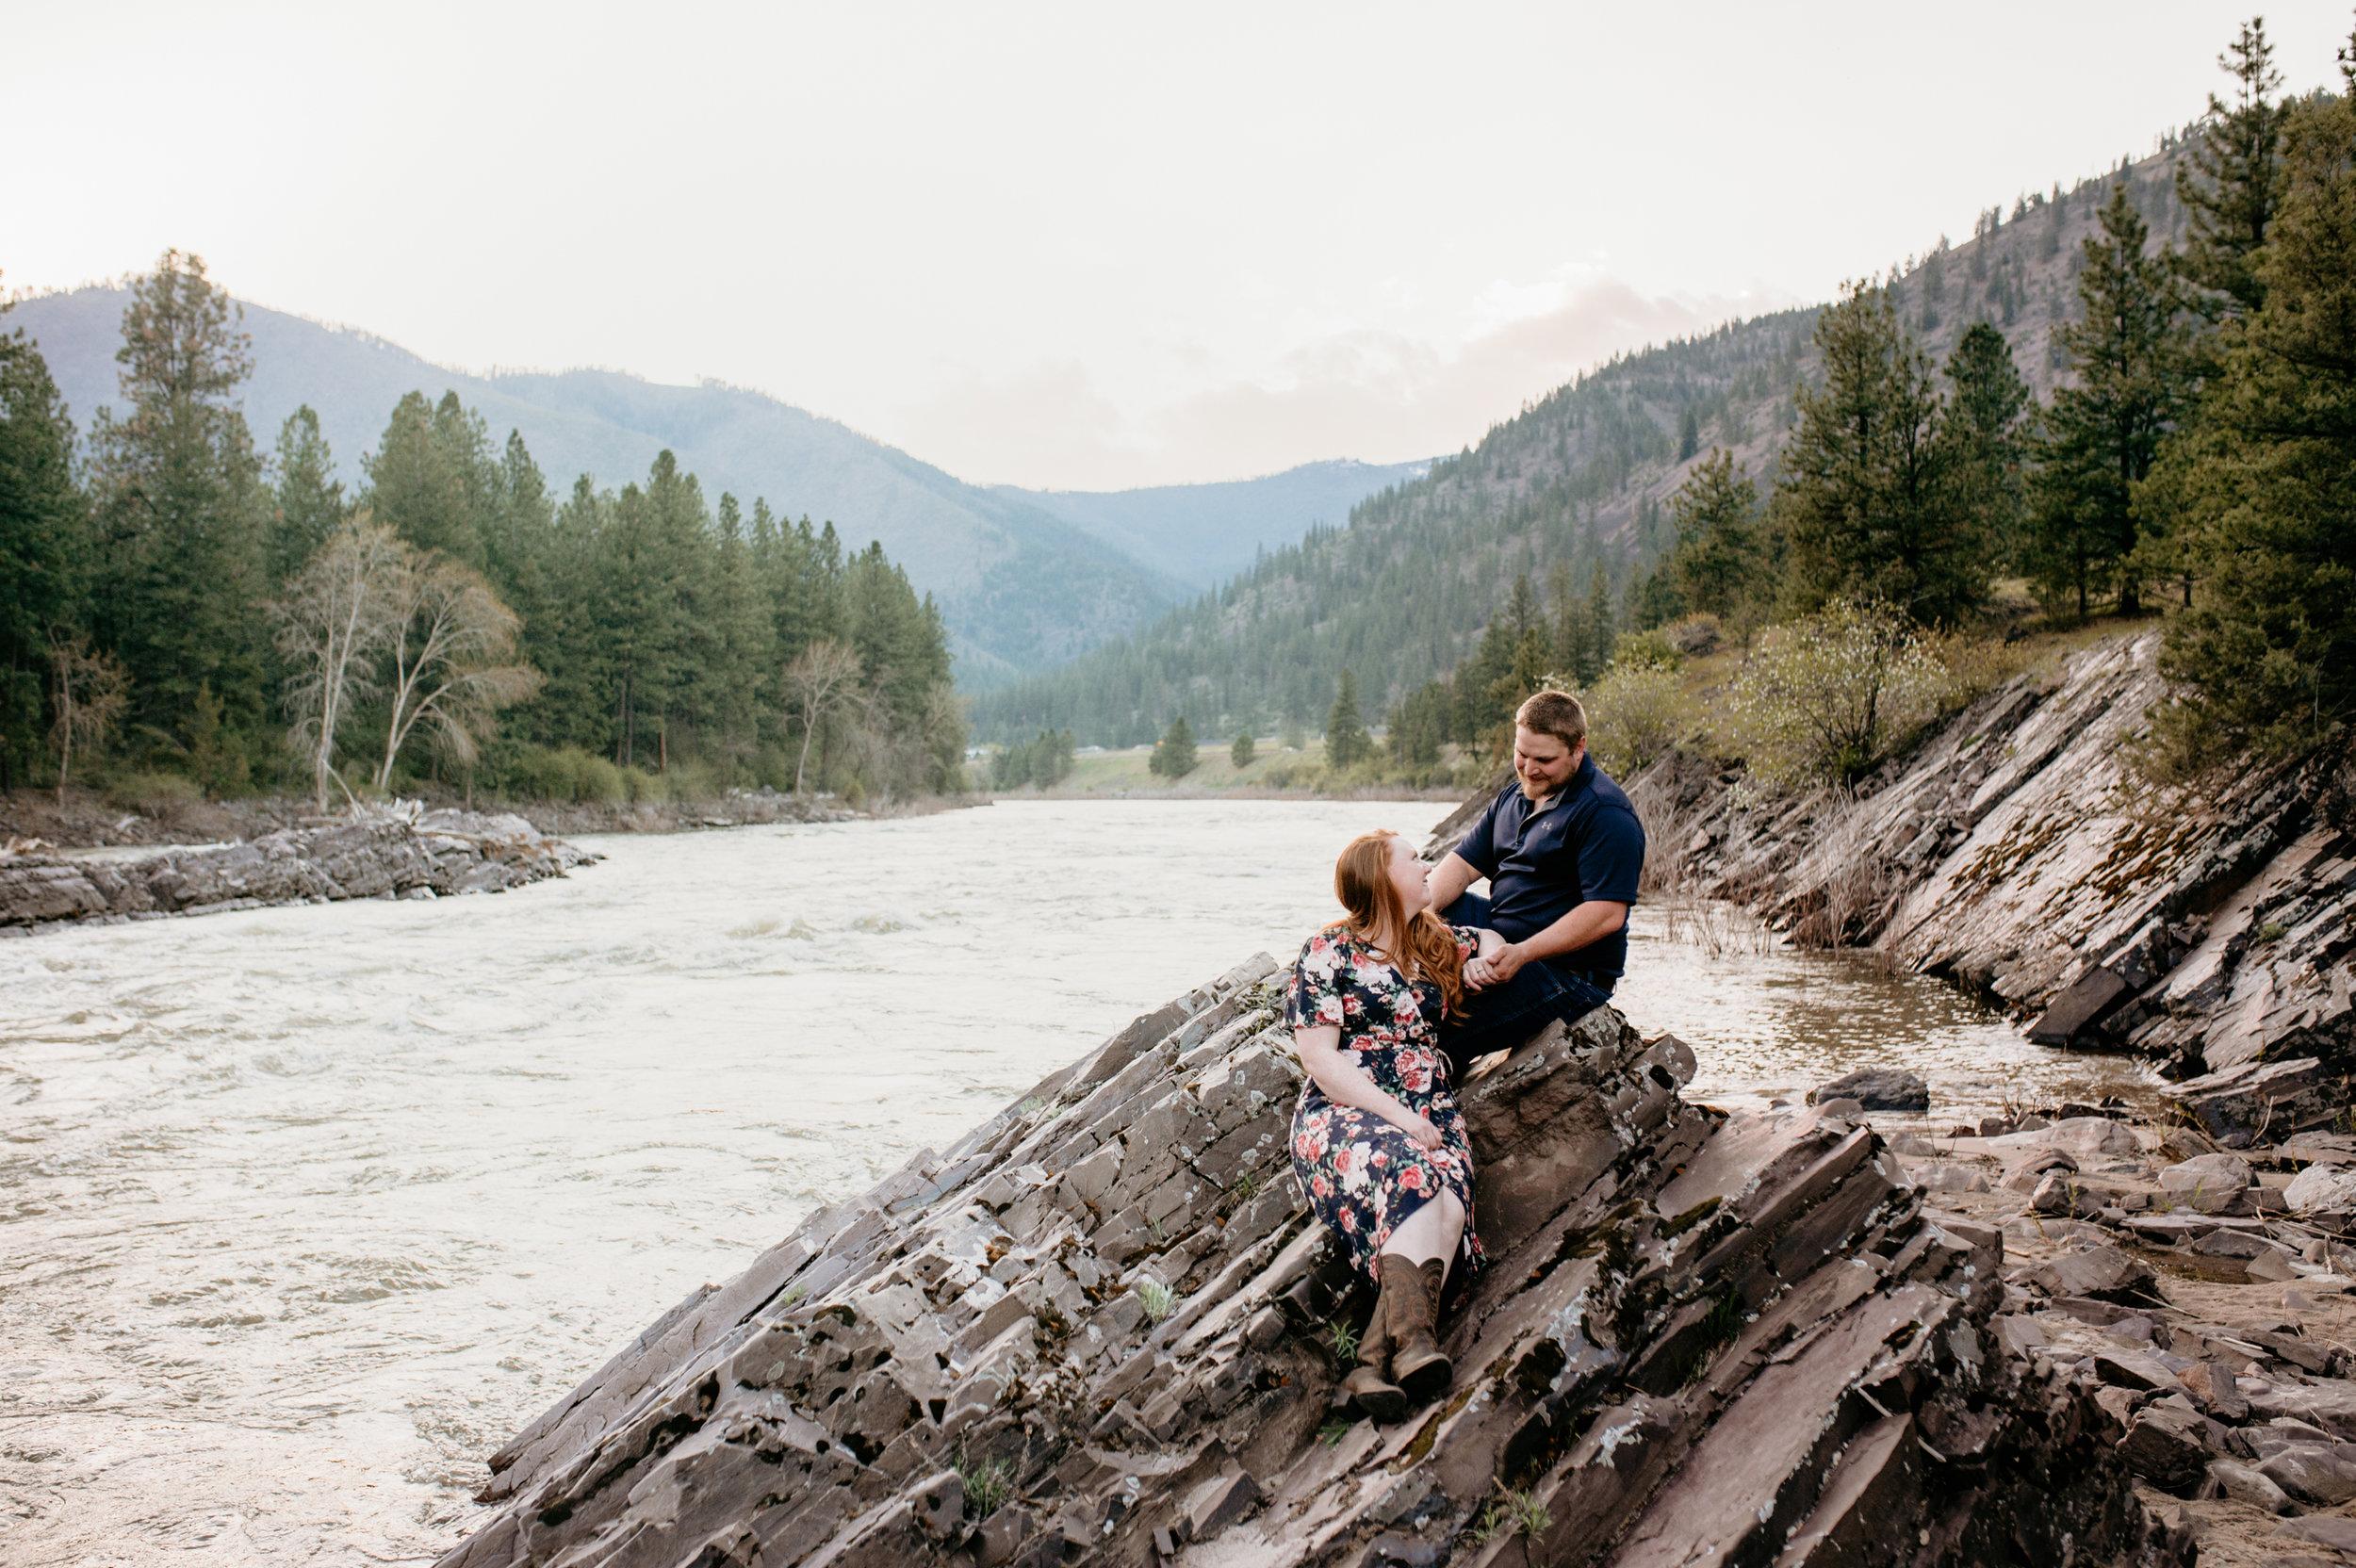 168White Raven Engagement Session_Megan & Justin_Honeybee Weddings_May 10, 2019-472.jpg